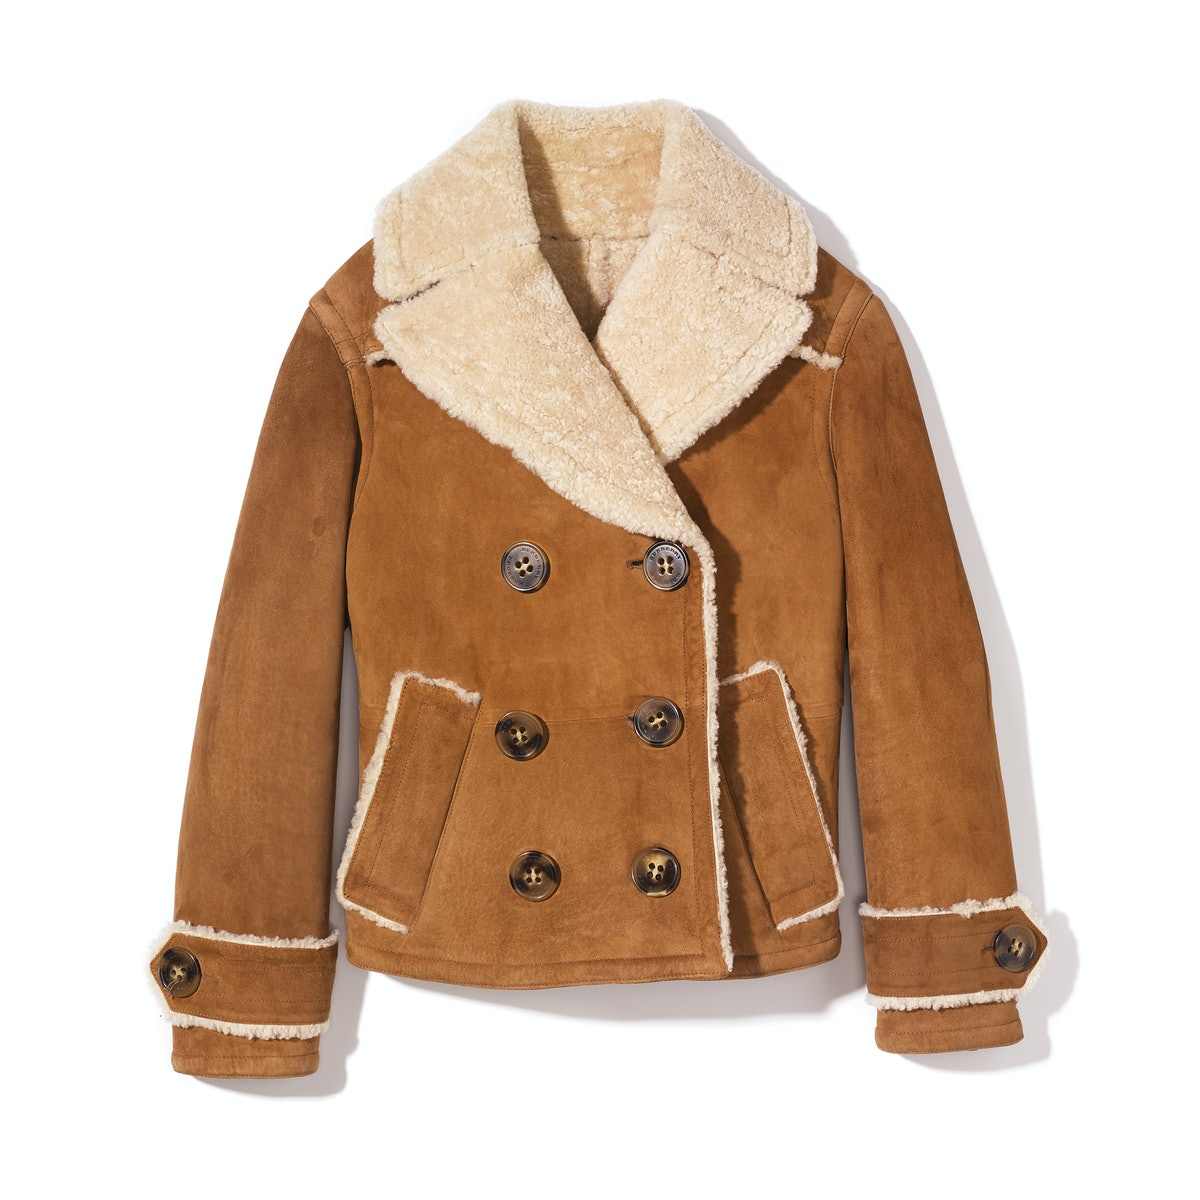 Burberry Prorsum jacket